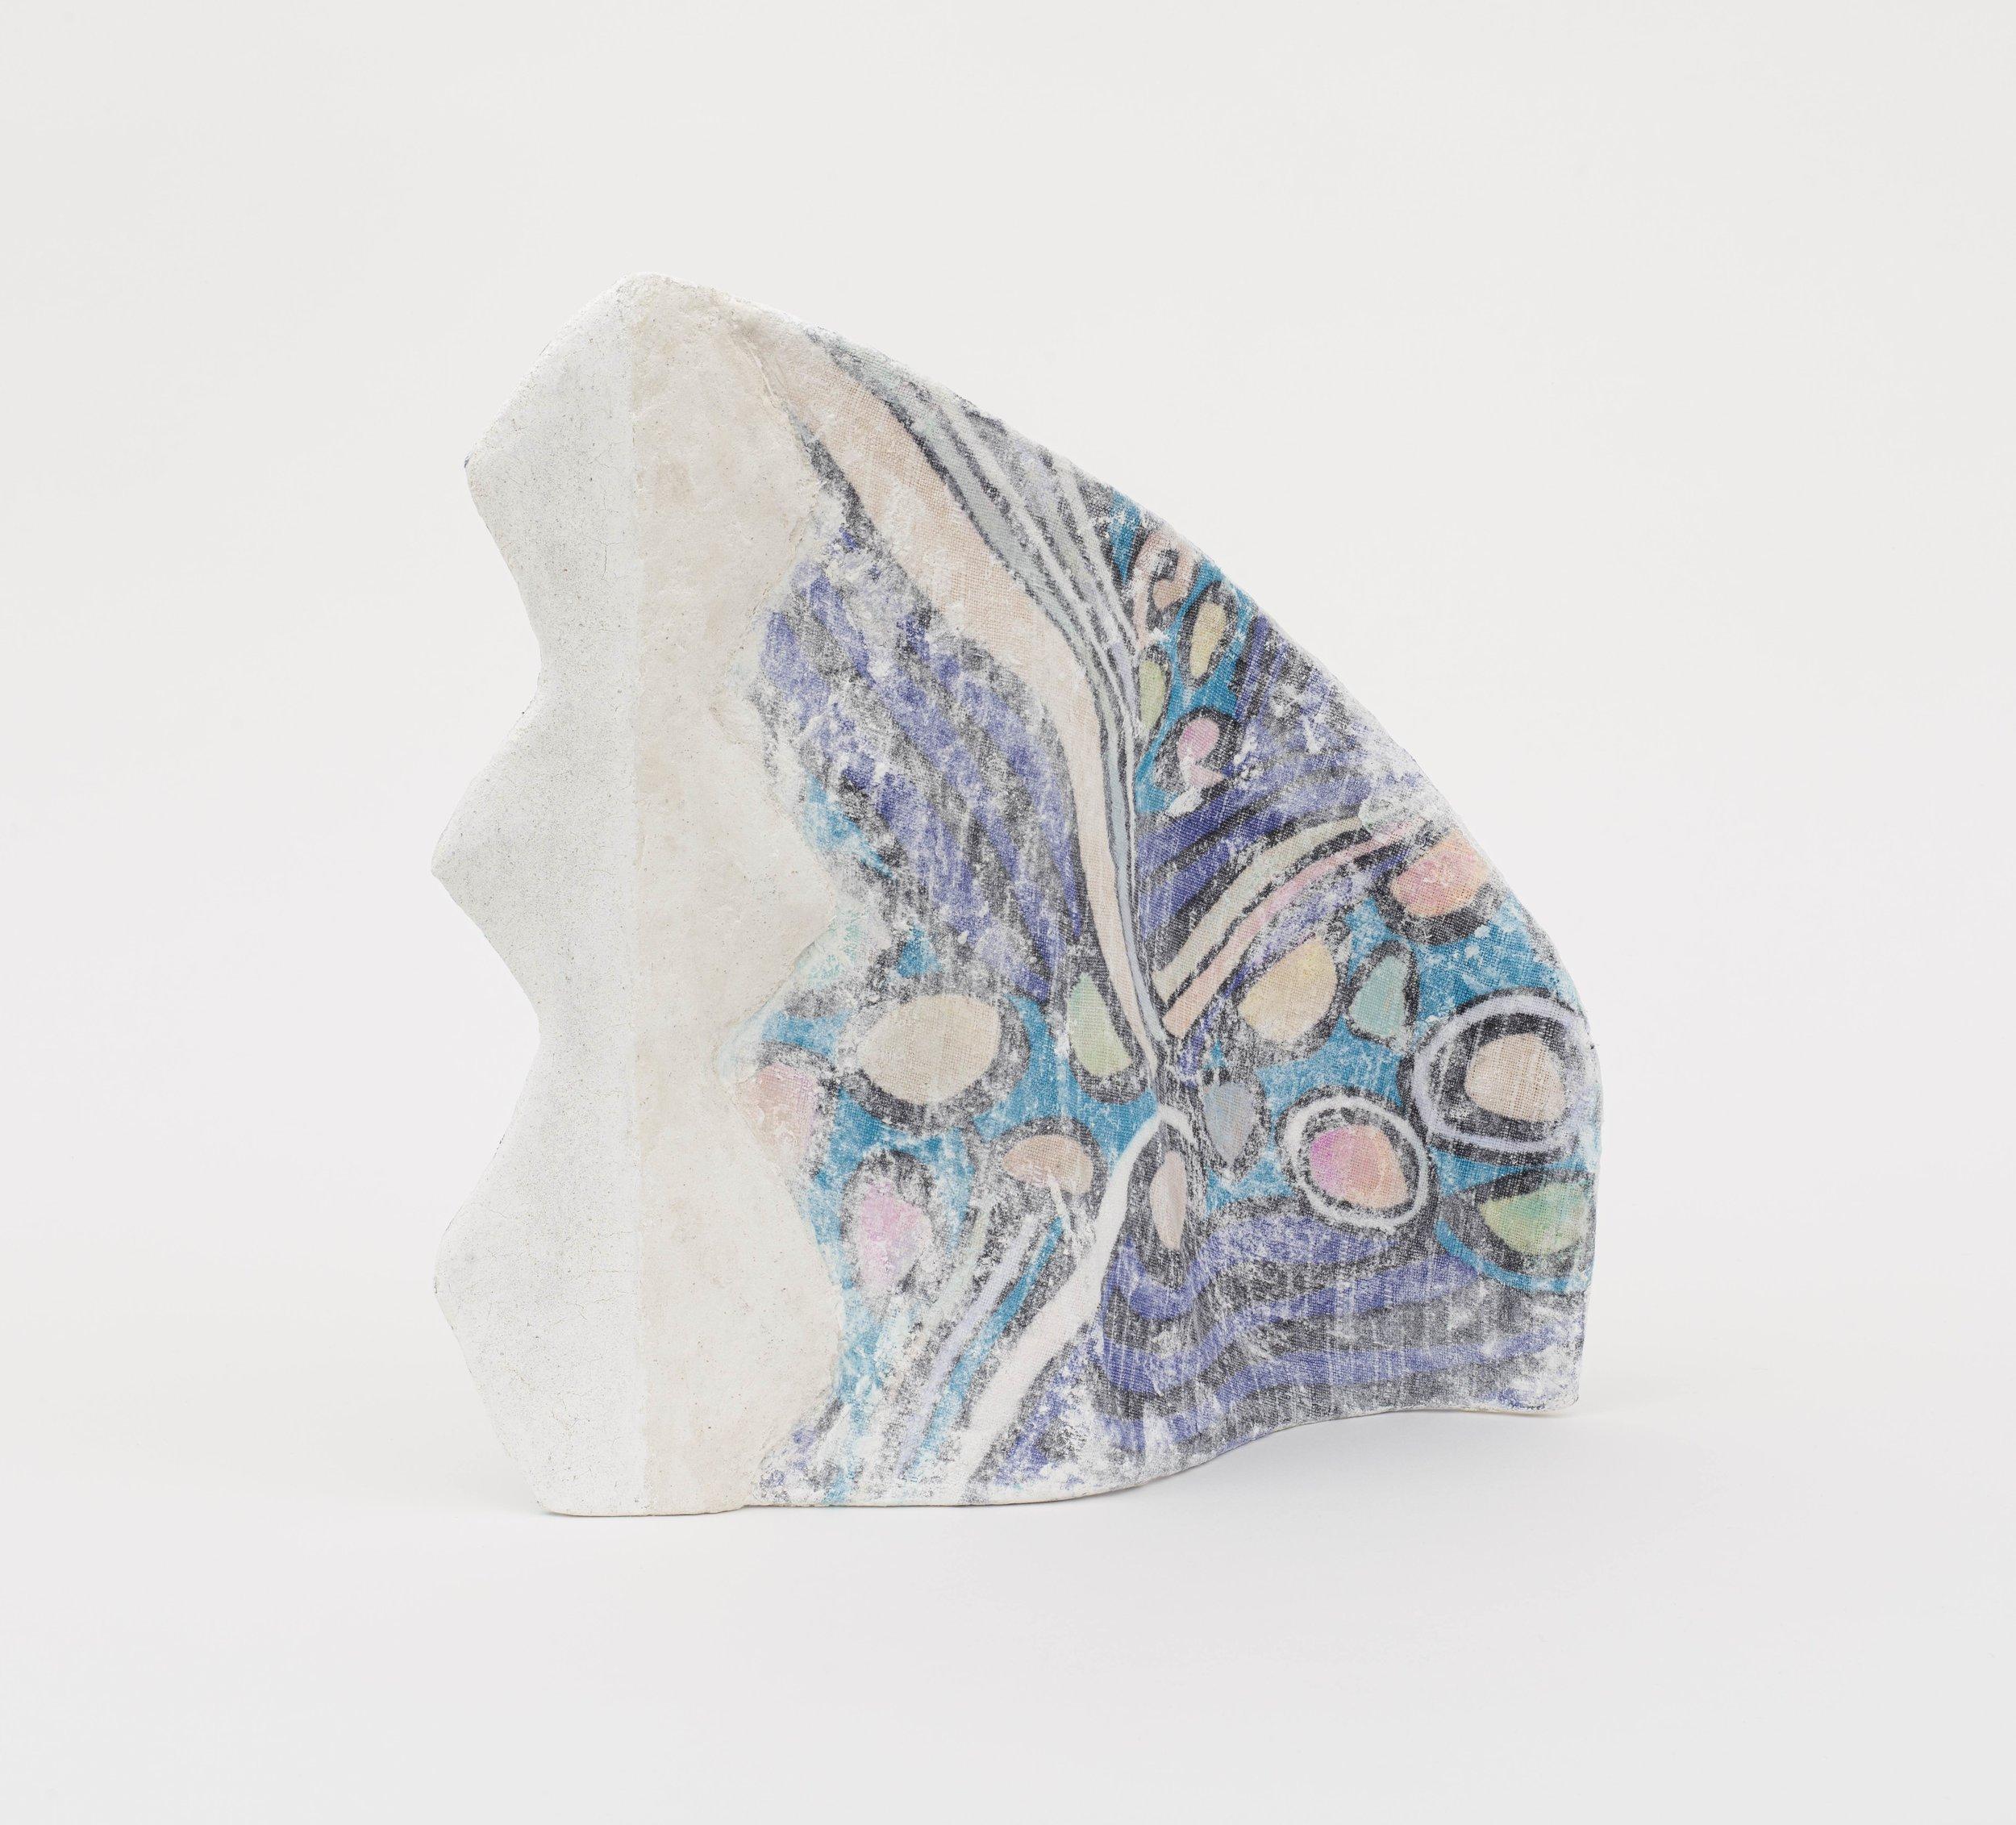 Jennifer Paige Cohen,  Phoenix Feather , 2019. Skirt, plaster, lime plaster, CelluClay, pigment. 13.5 x 13 x 5 inches. 34.3 x 33 x 12.7 cm.